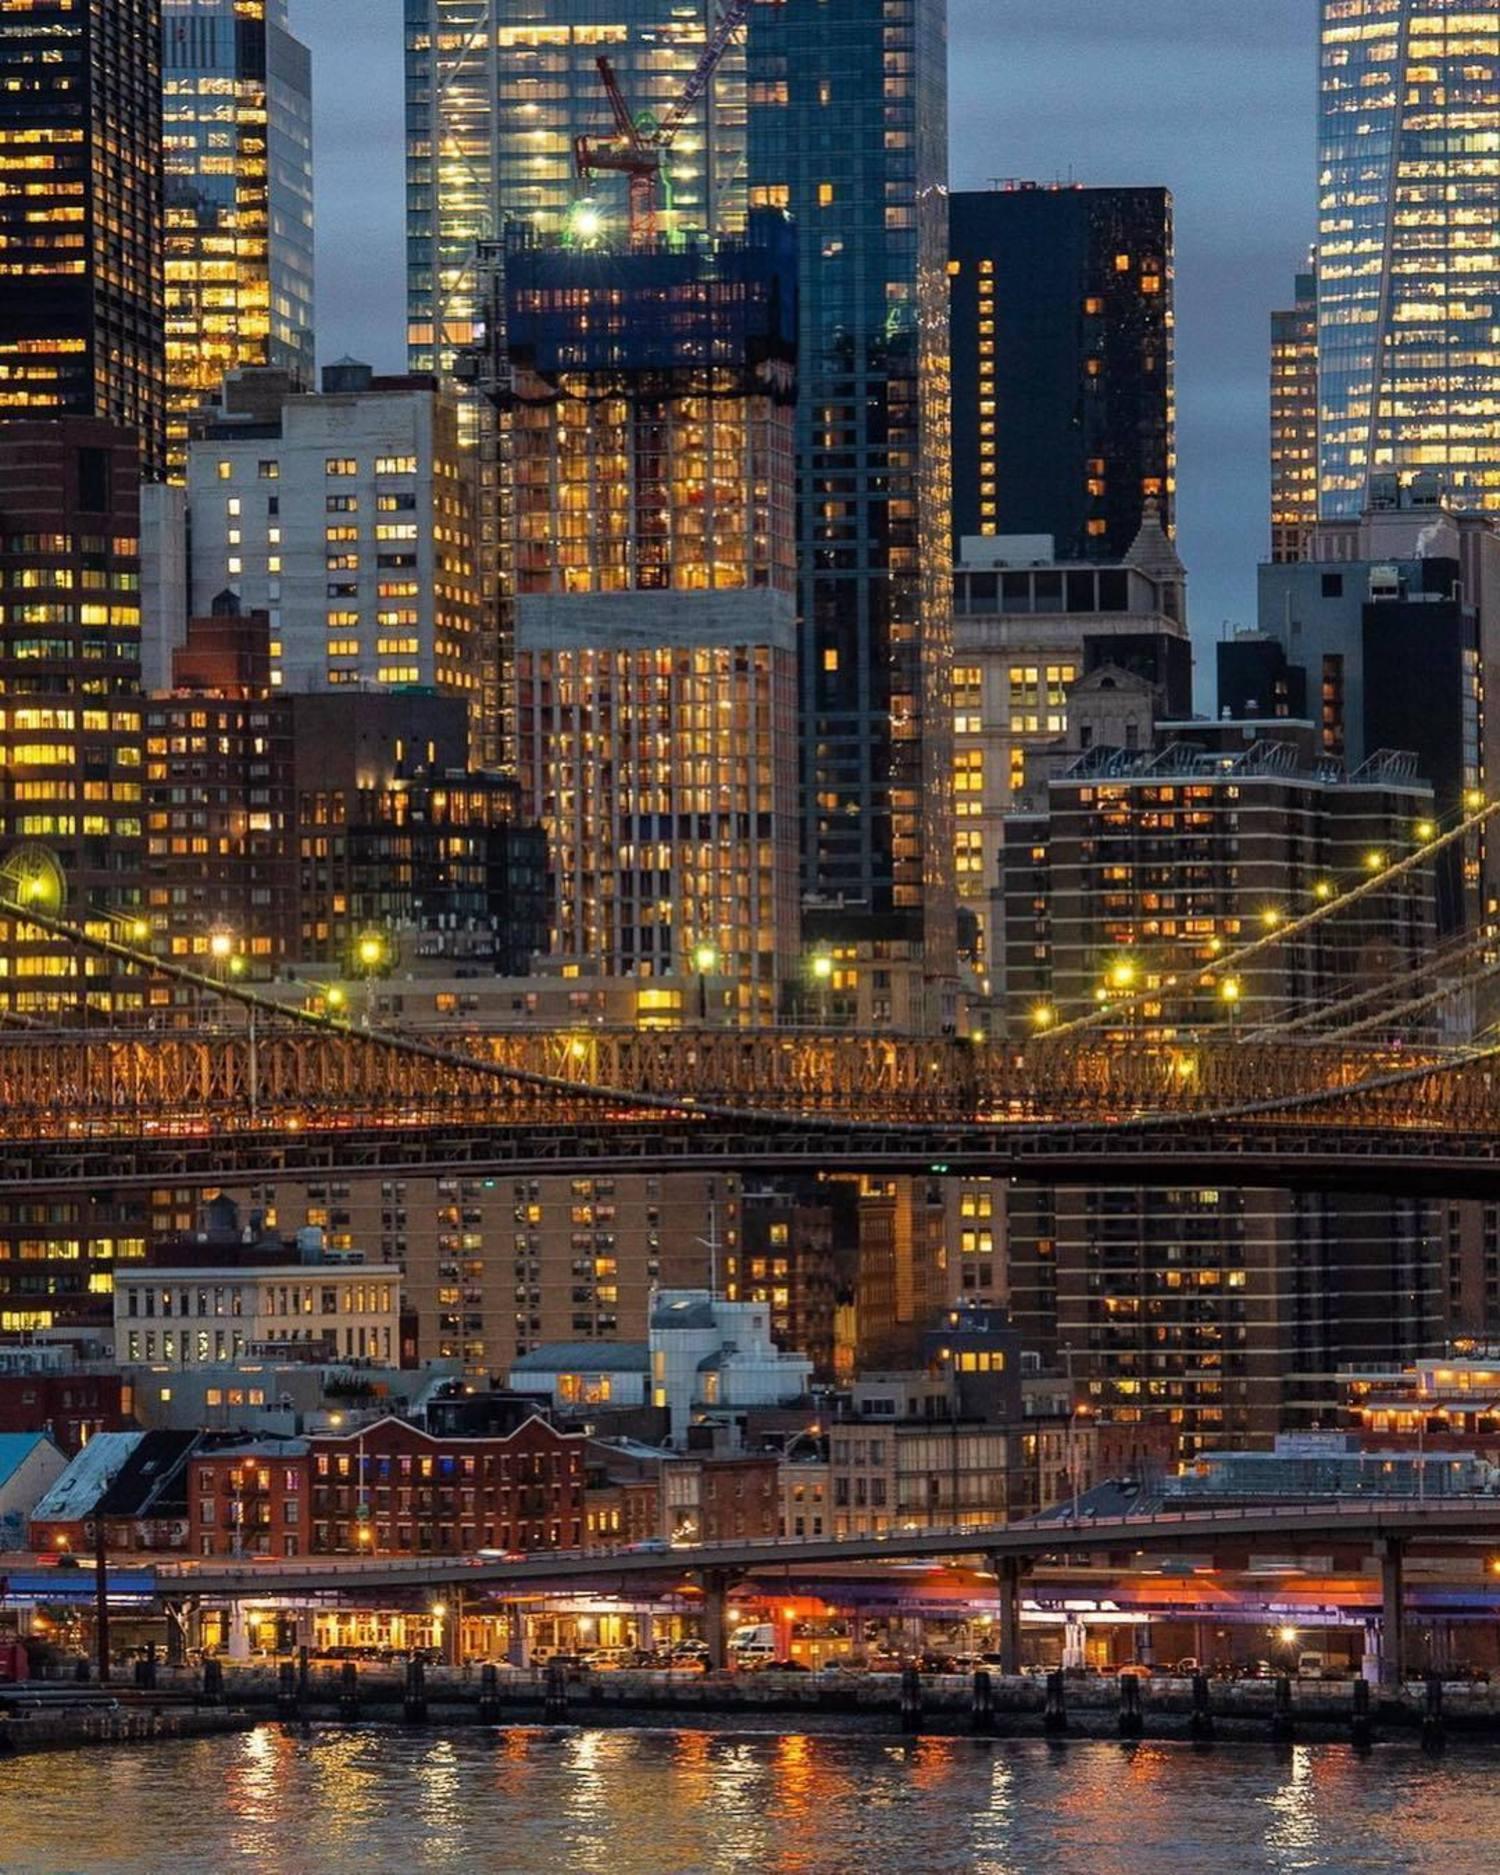 Seaport, Manhattan. Photo via @julienneschaer #viewingnyc #nyc #newyork #newyorkcity